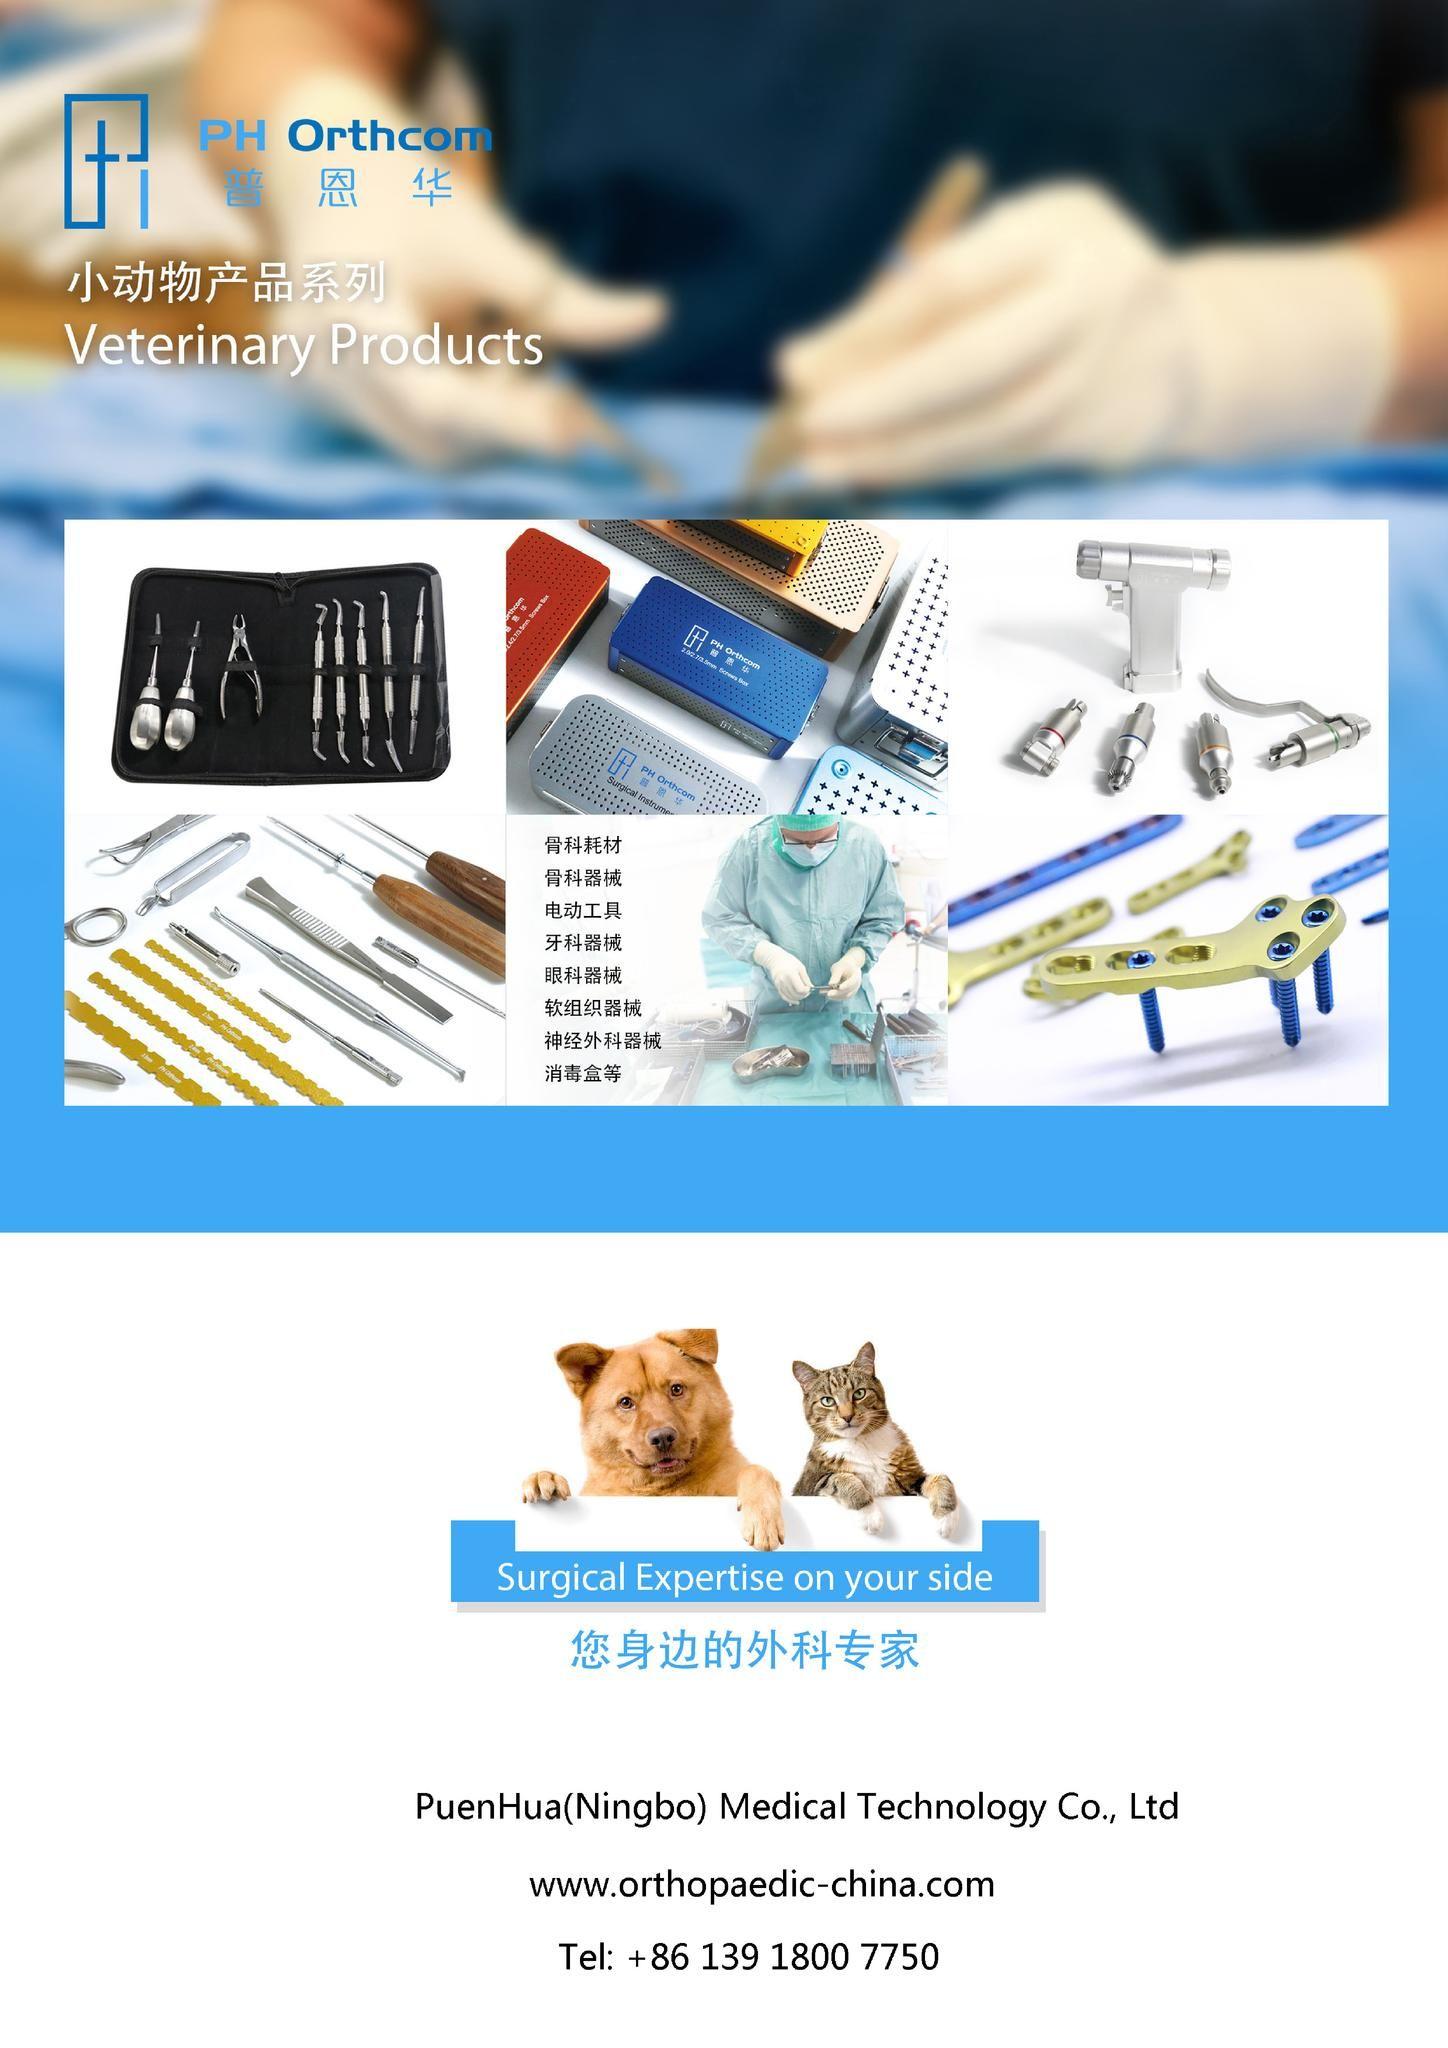 PH Orthcom Vet Orthopedic implants and Instruments